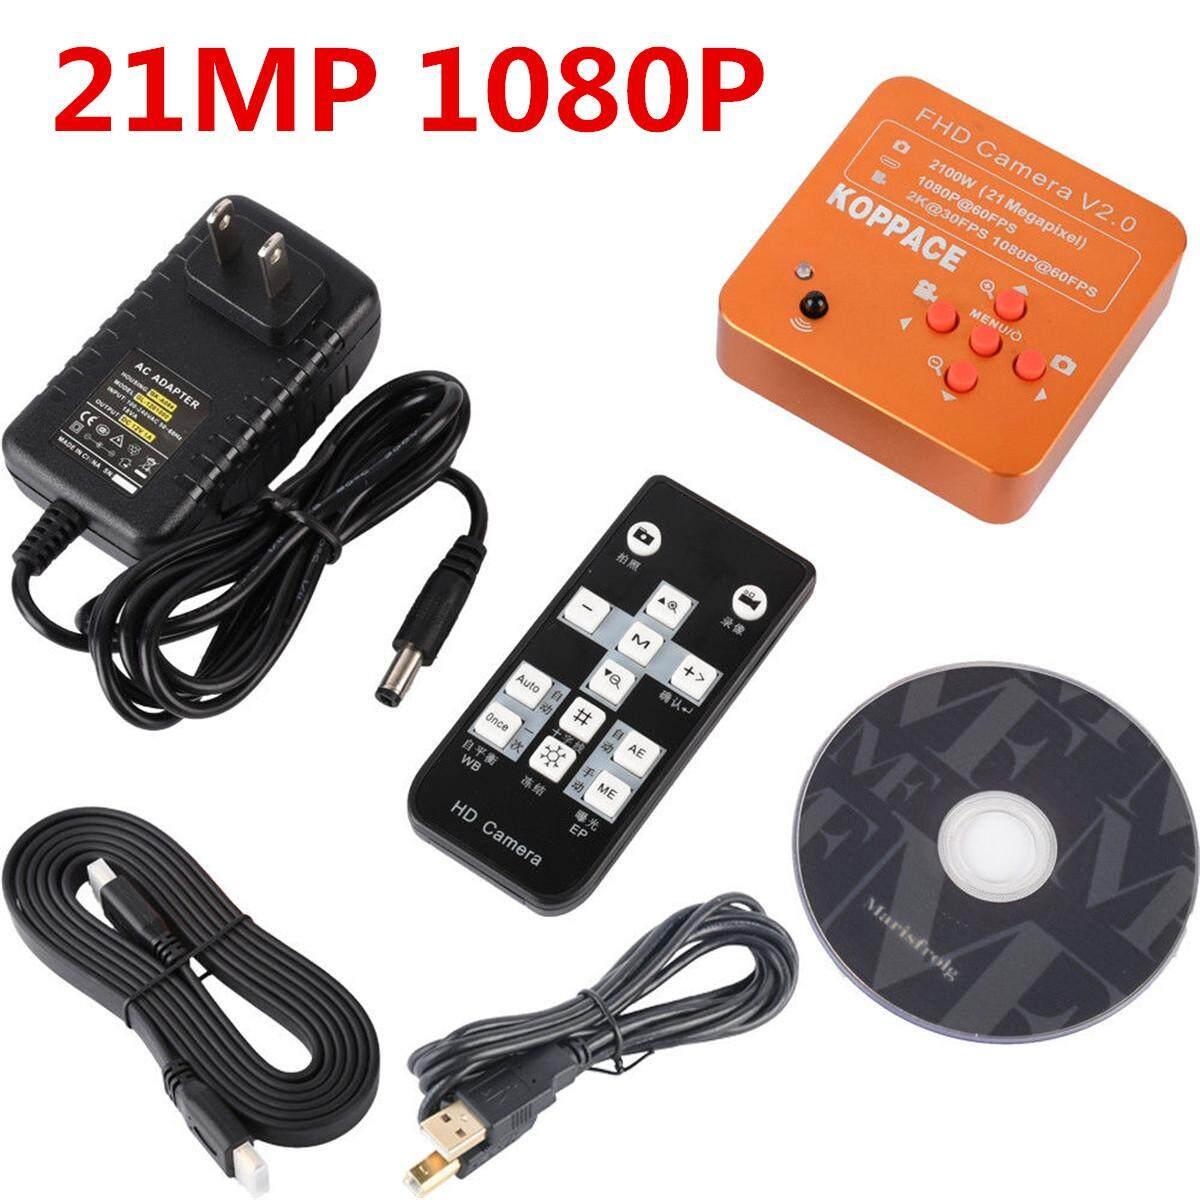 Koppace 21mp 1080p 60fps Hdmi Usb Fhd Industrial Microscope Digital Camera By Freebang.